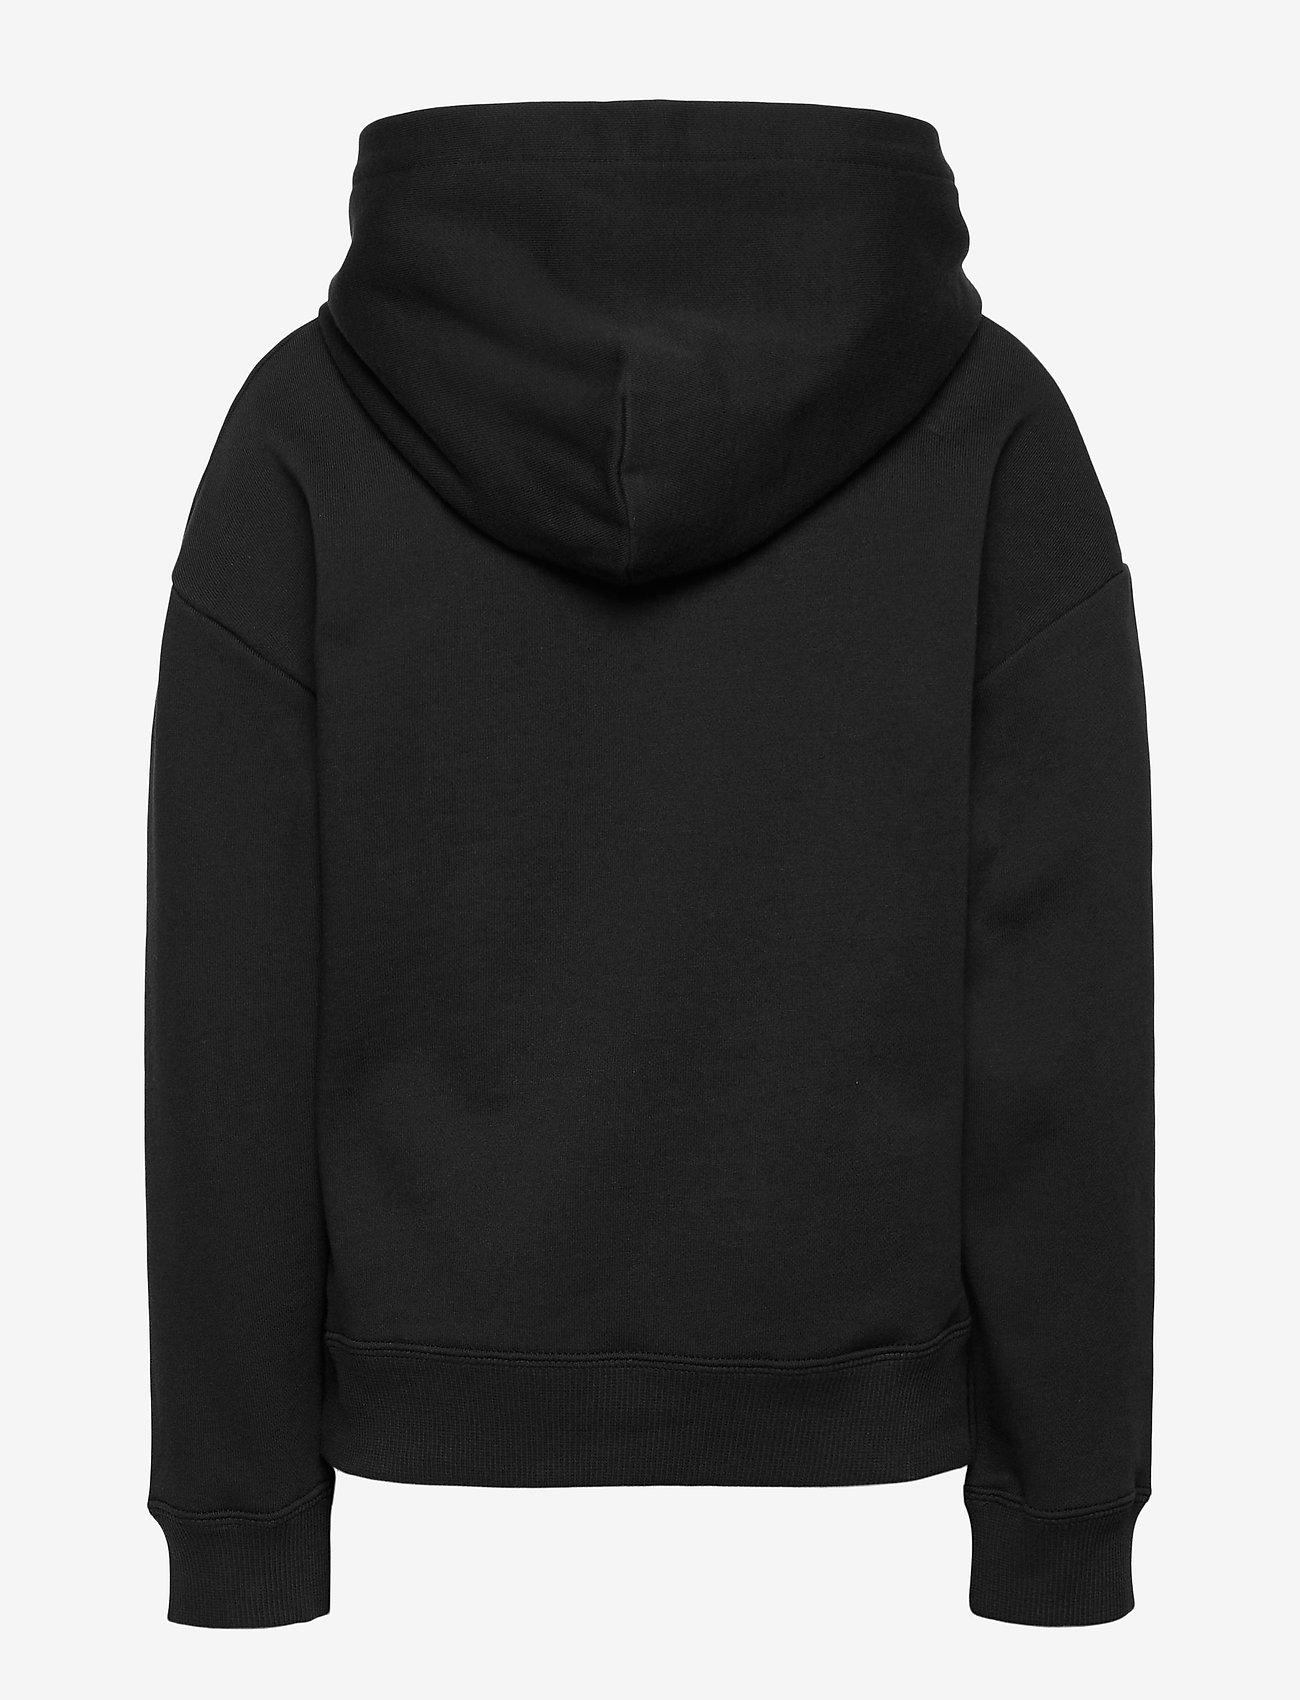 Calvin Klein - REFLECTIVE LOGO HOODIE - kapuzenpullover - ck black - 1